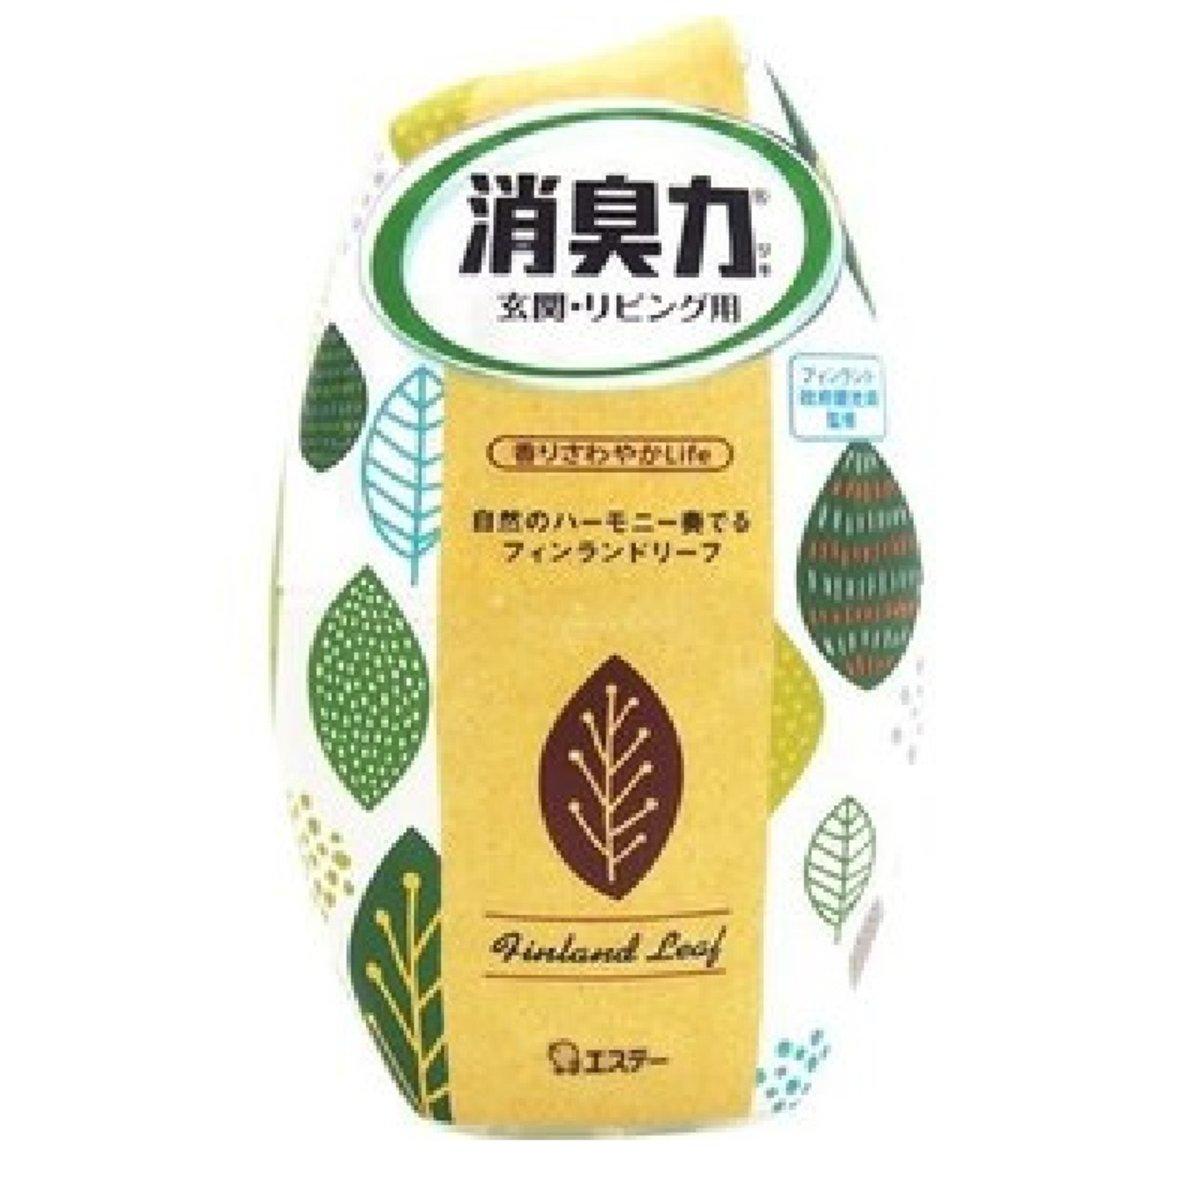 S.T. Corporation Indoor Deodorant (Leaf) #Natural Fragrance 400ml